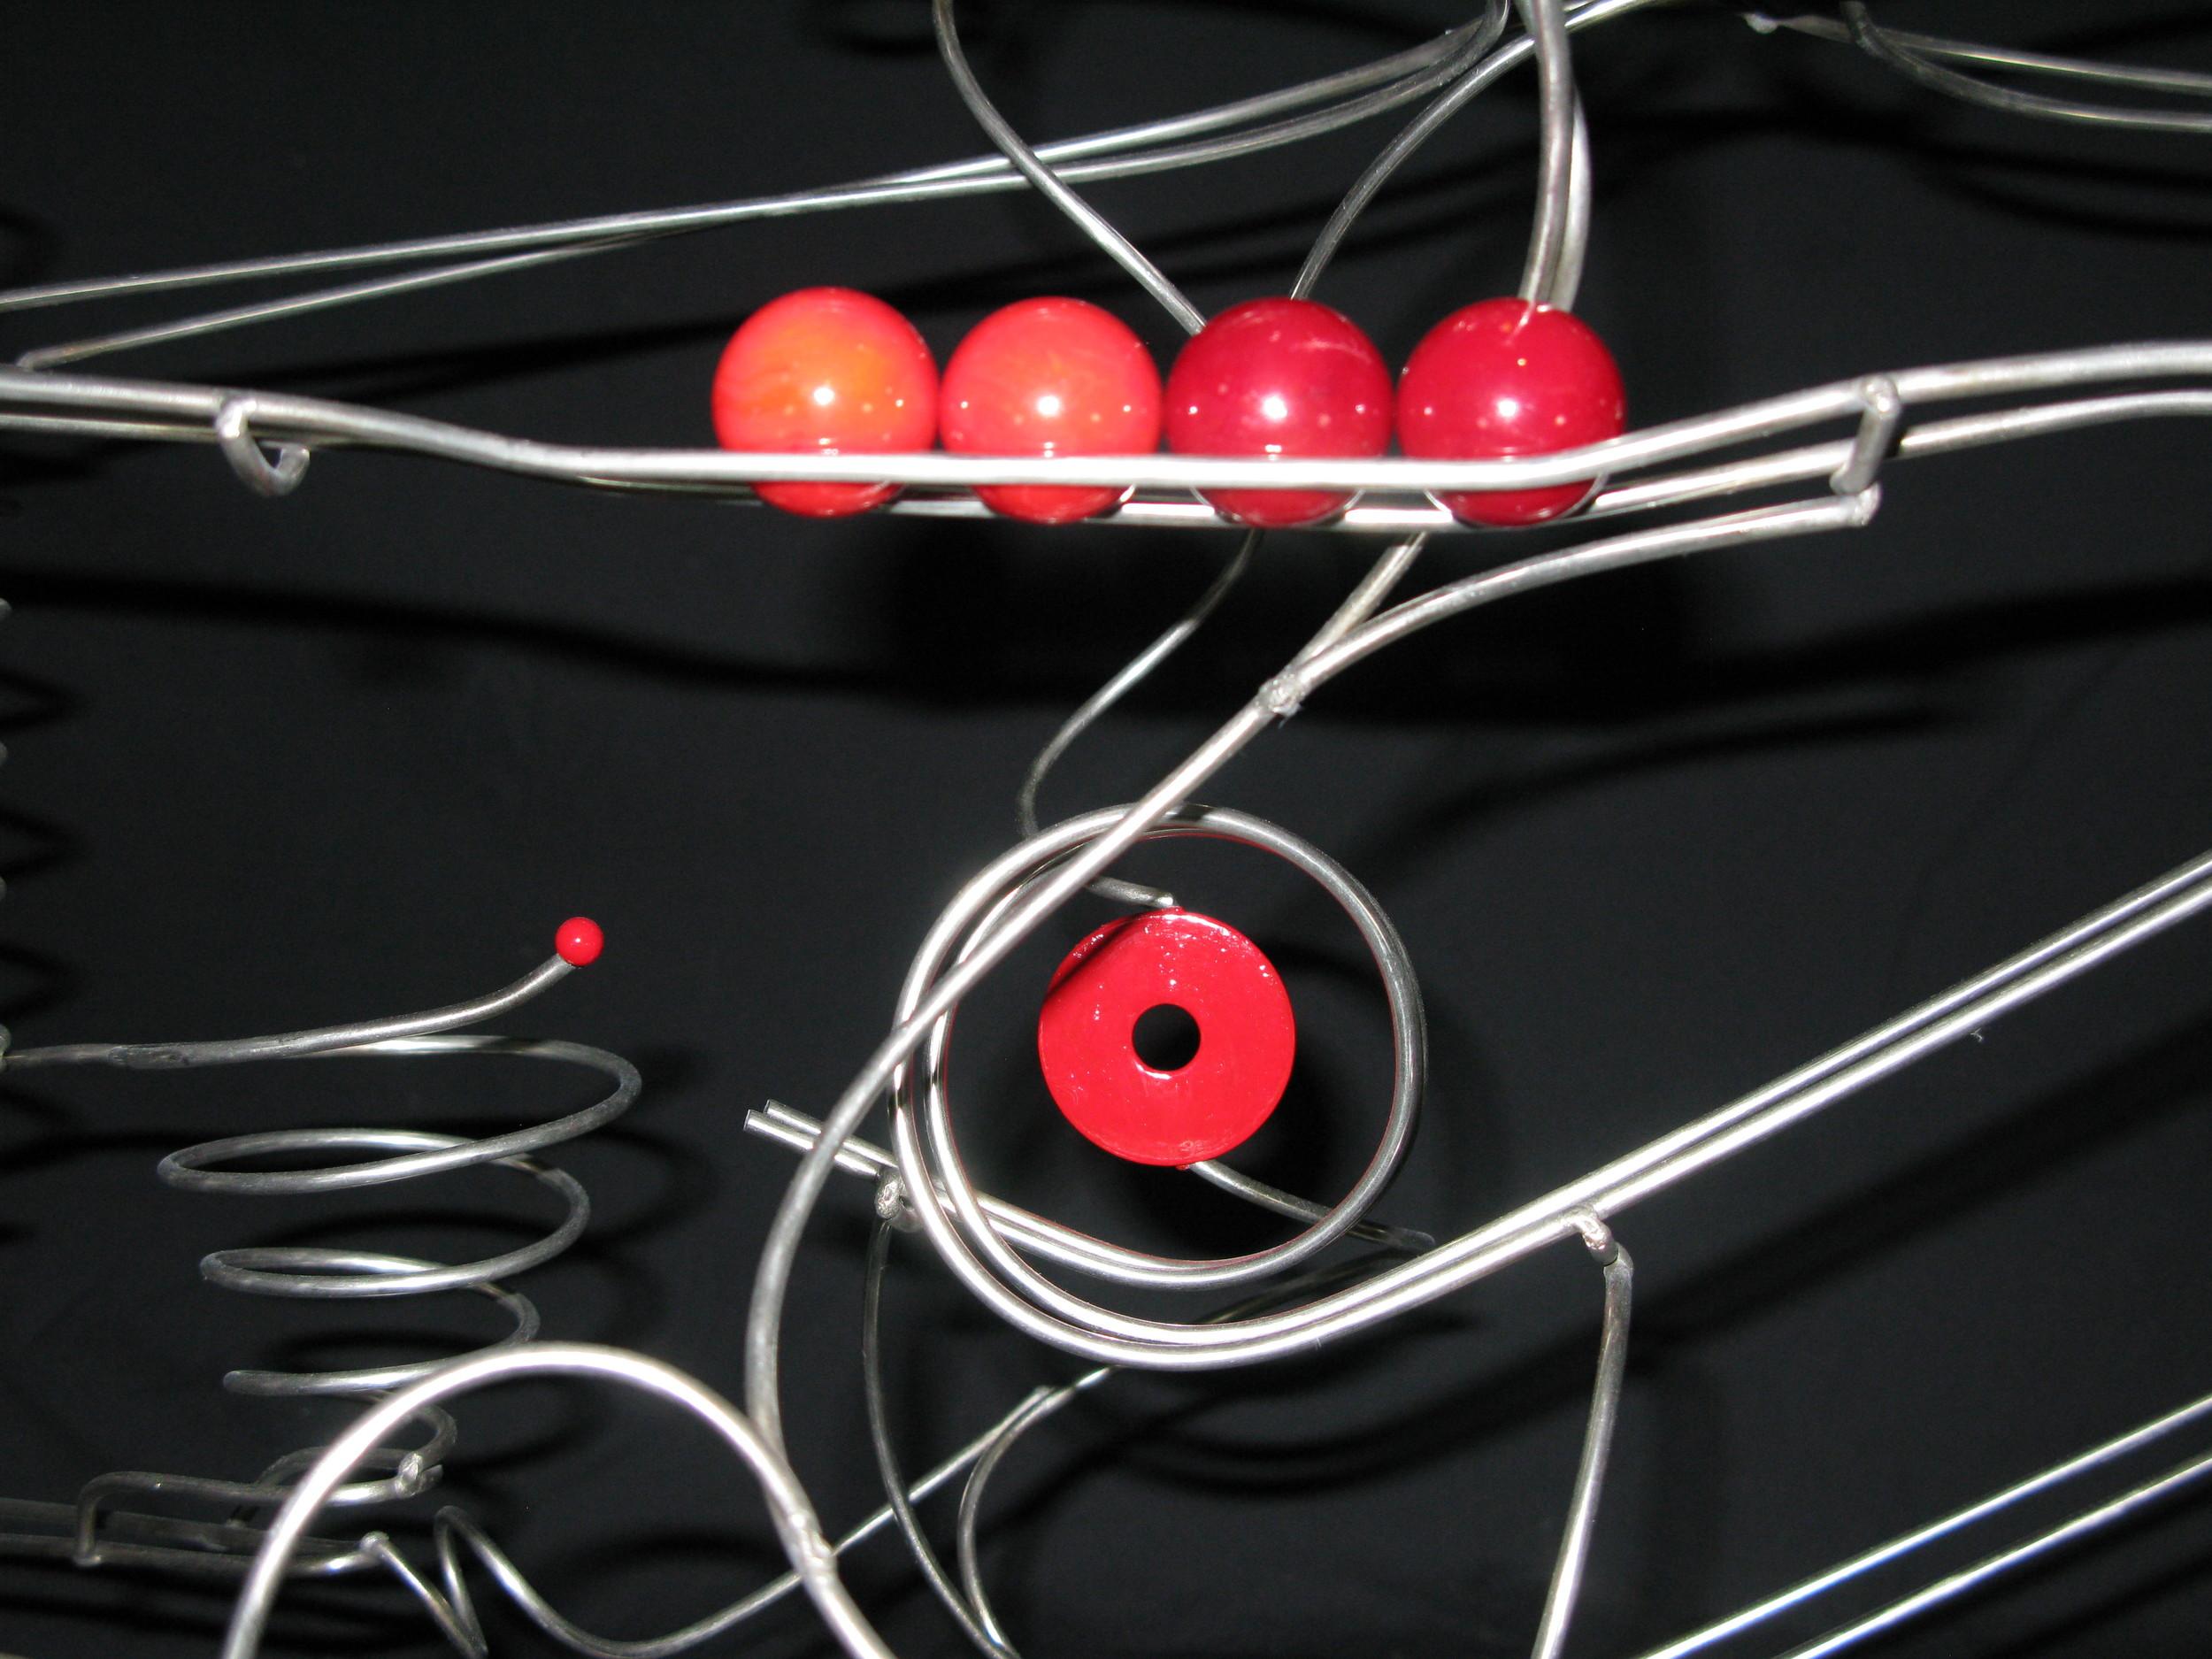 Kugelbahn-Marble-Art-Sculpture-Stephen-Jendro-035.JPG